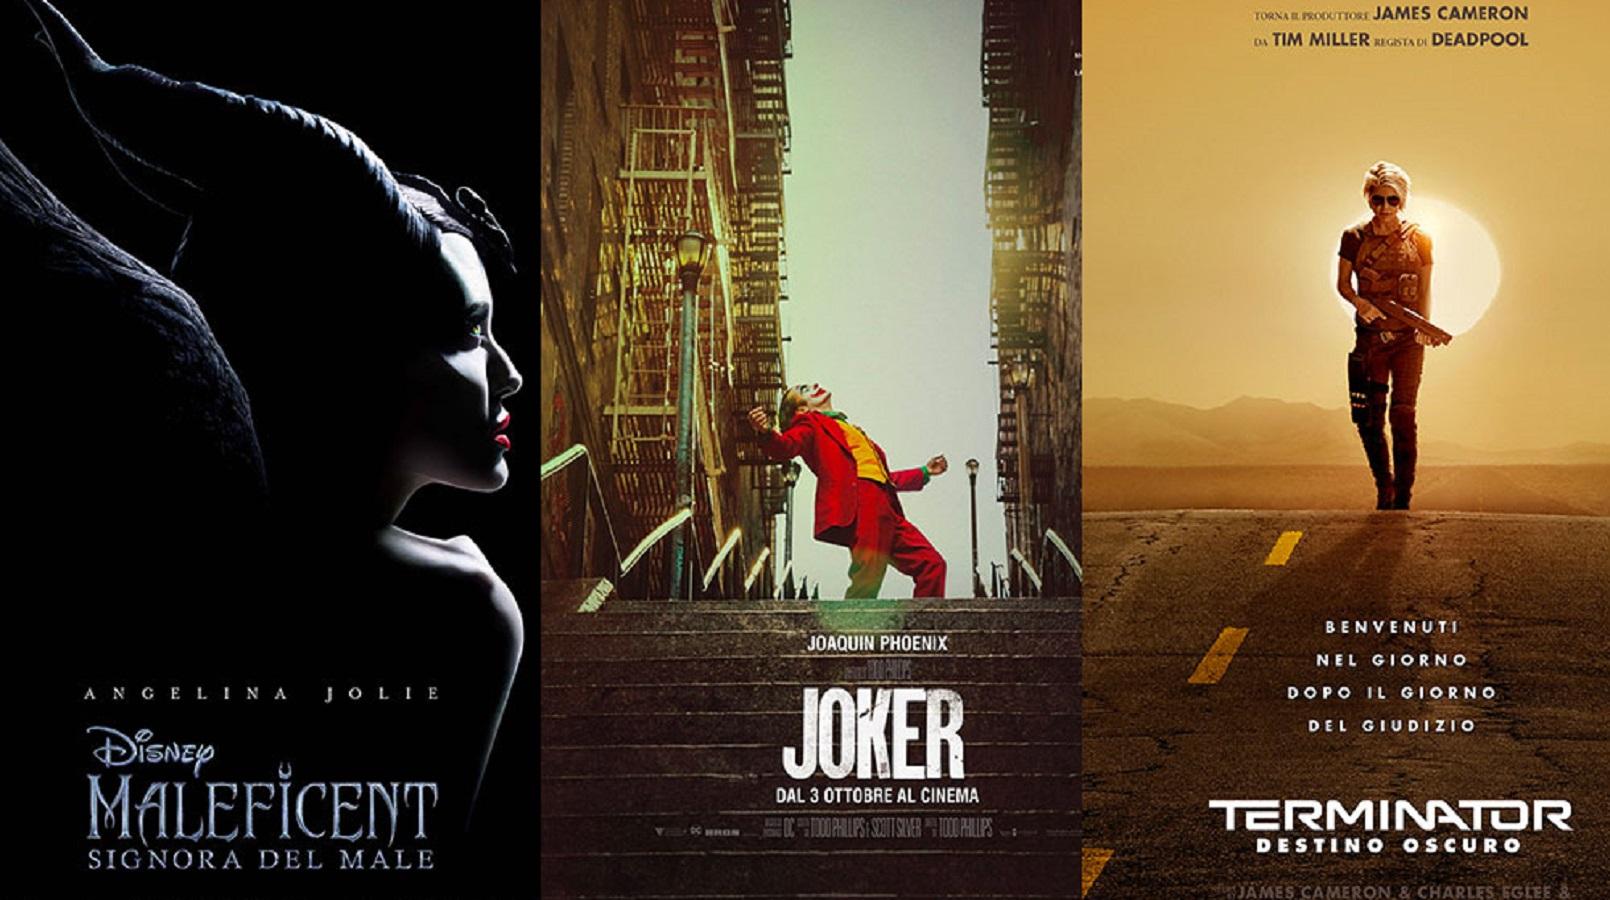 locandina dei film Maleficent, Joker e Terminator